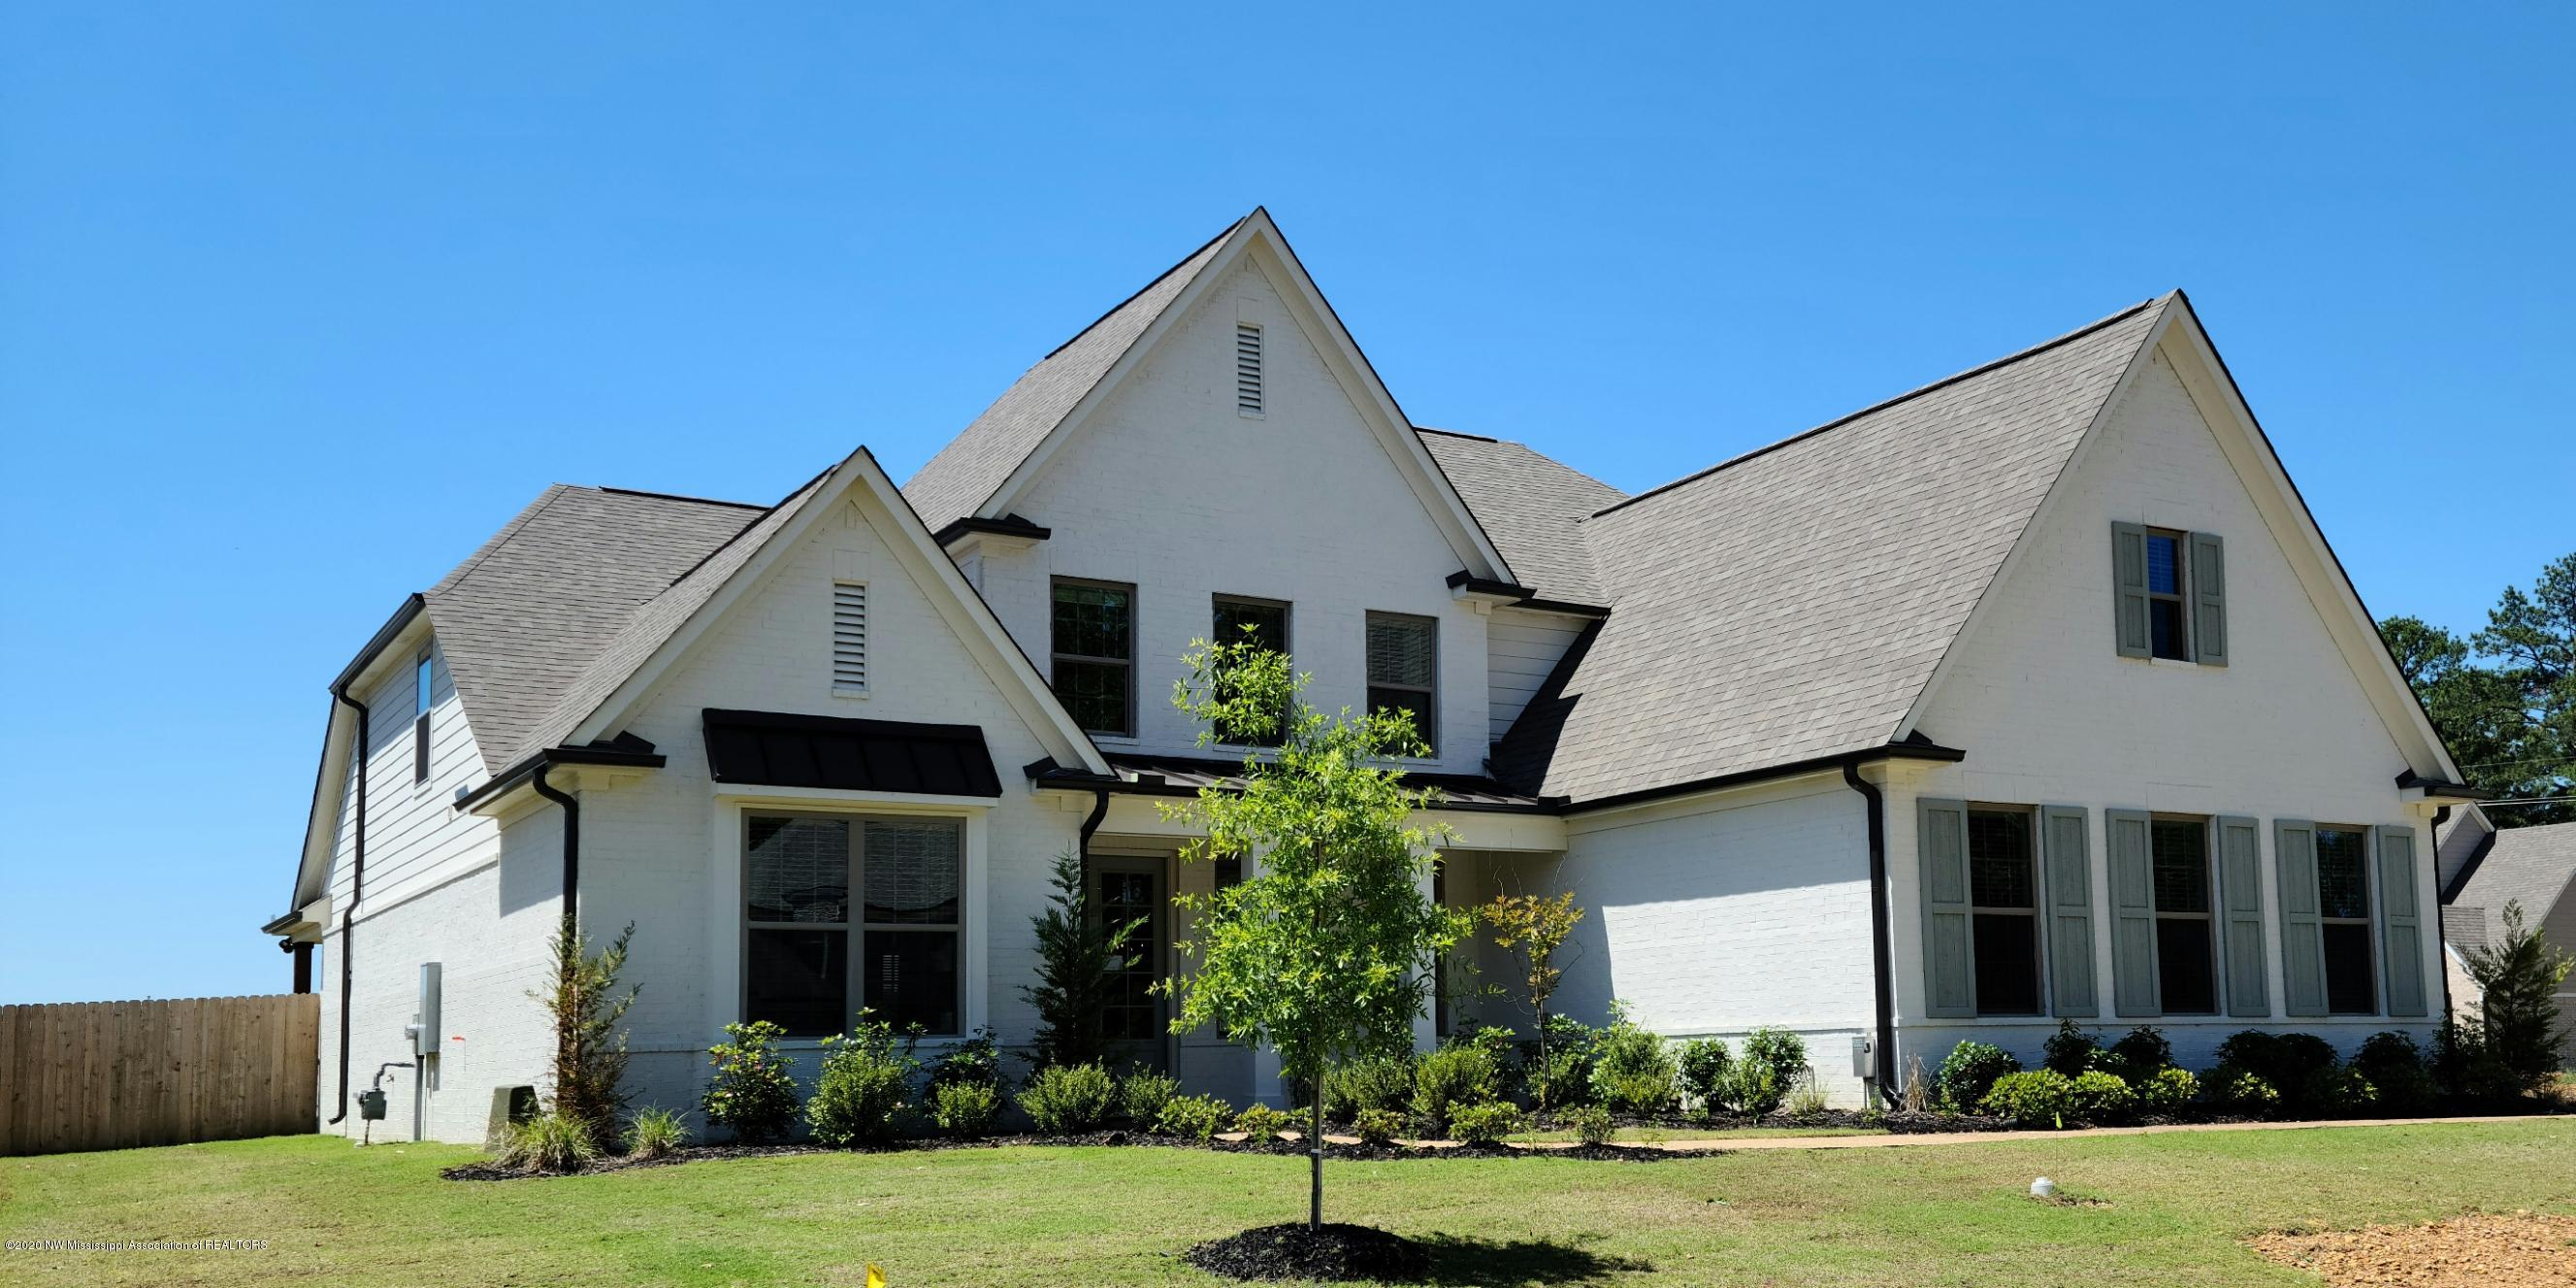 Crossroads Model Home